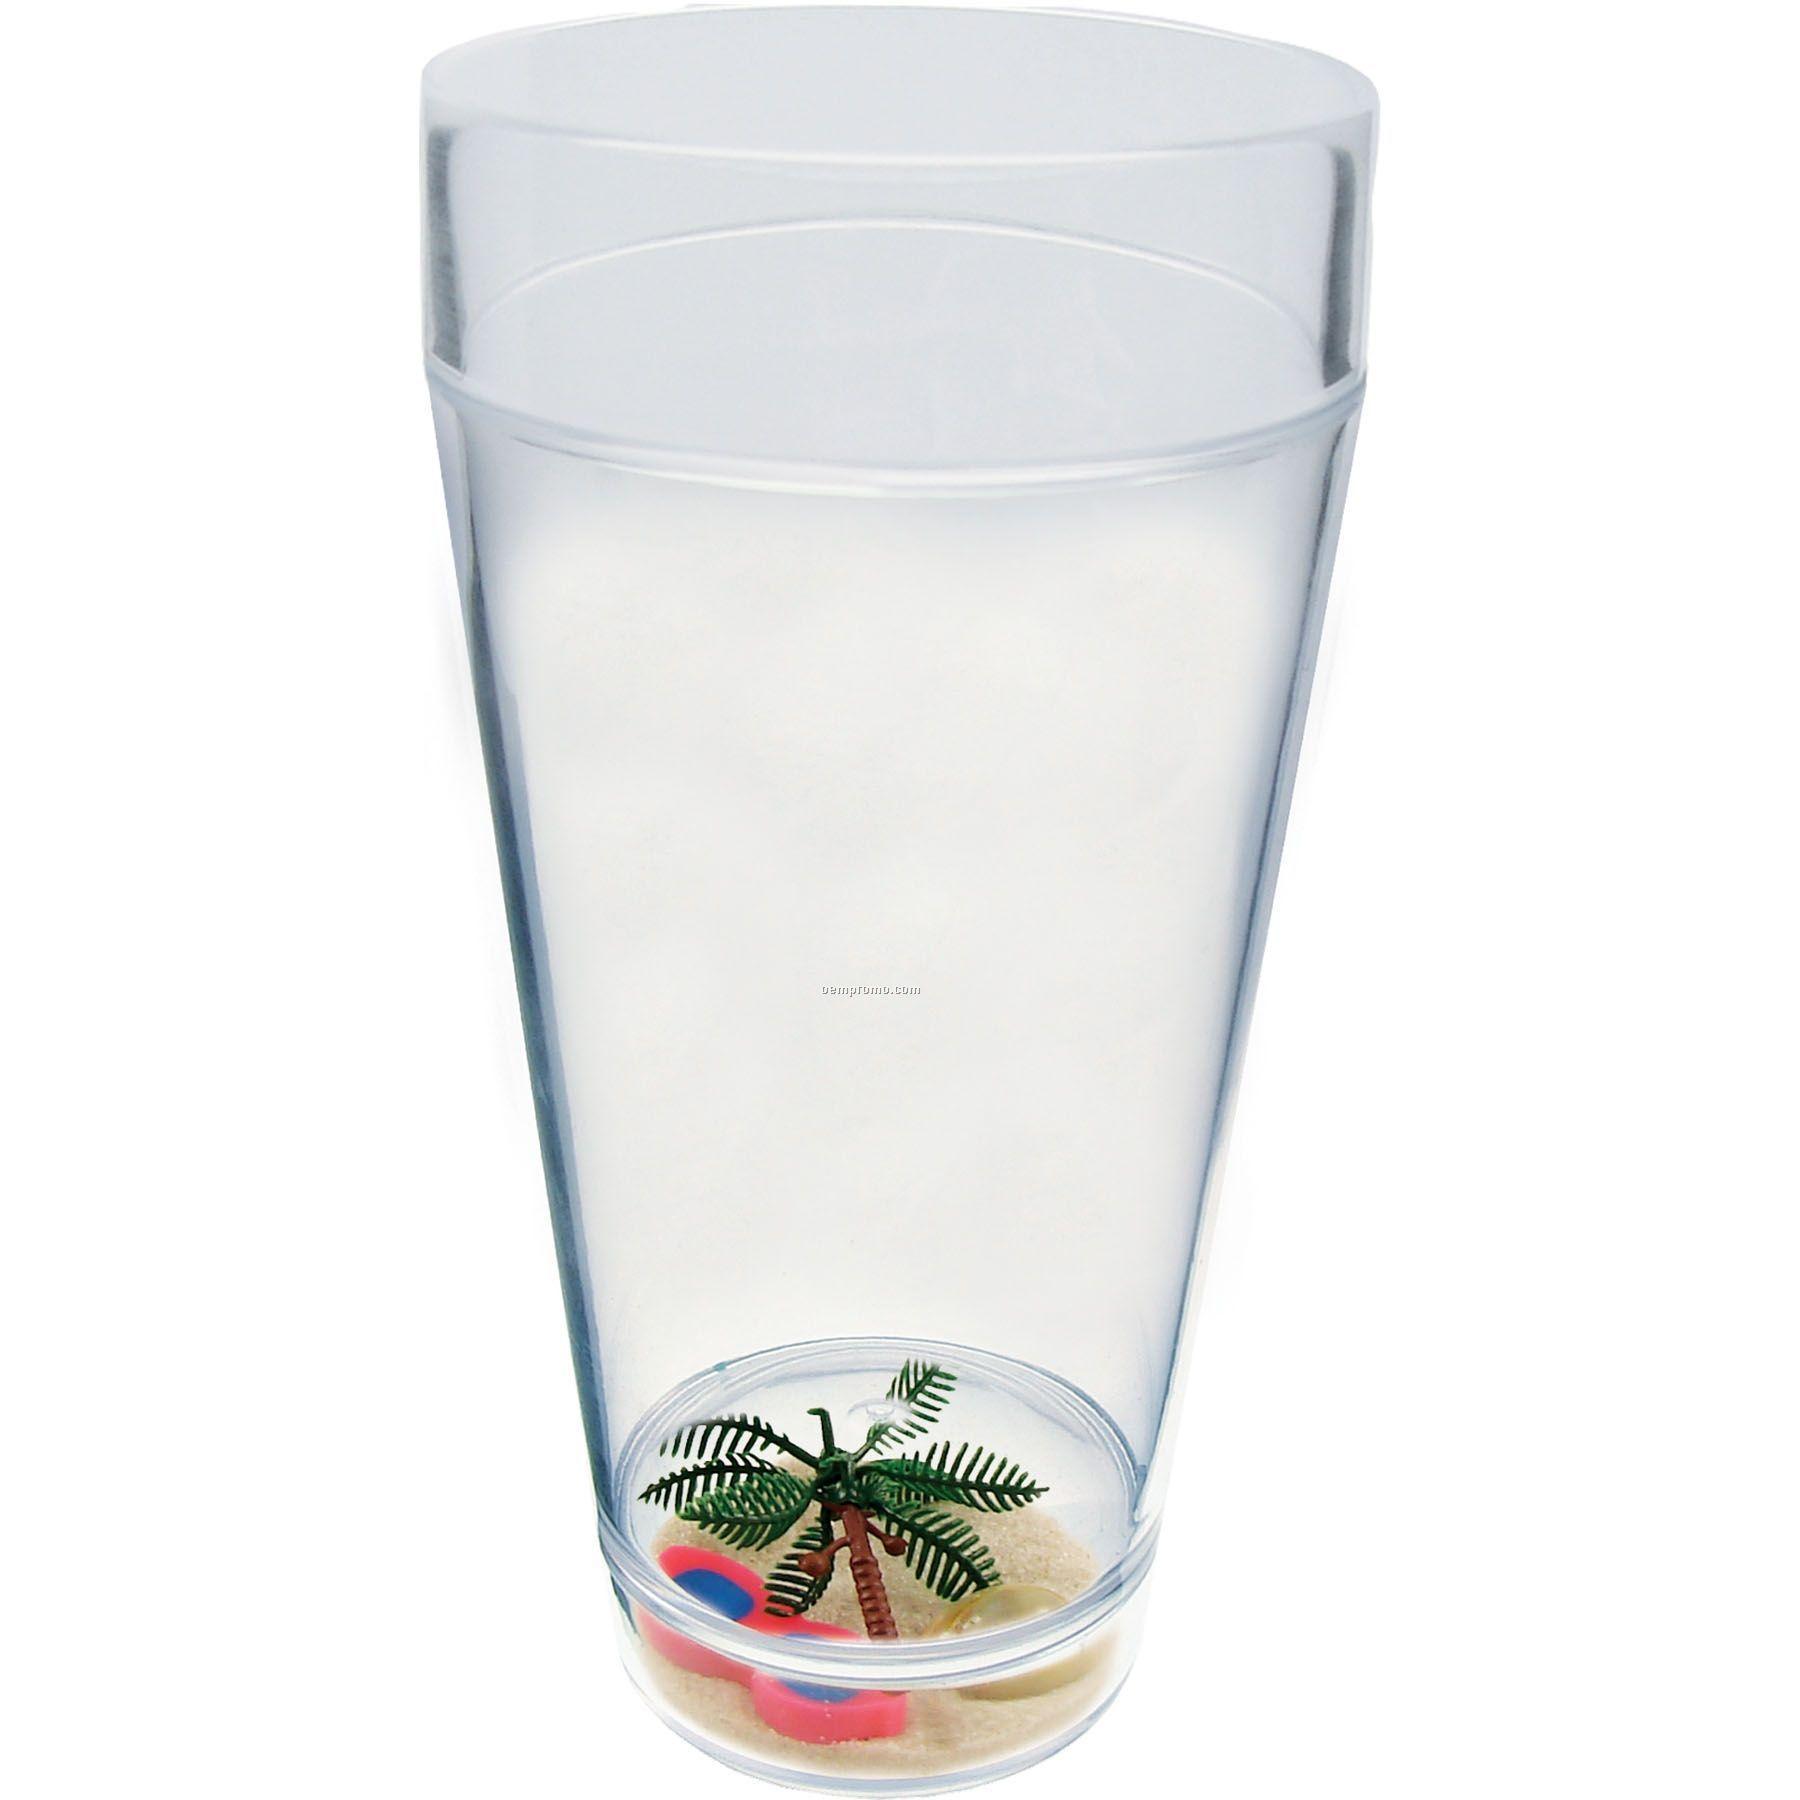 20 Oz. Beach Compartment Cup